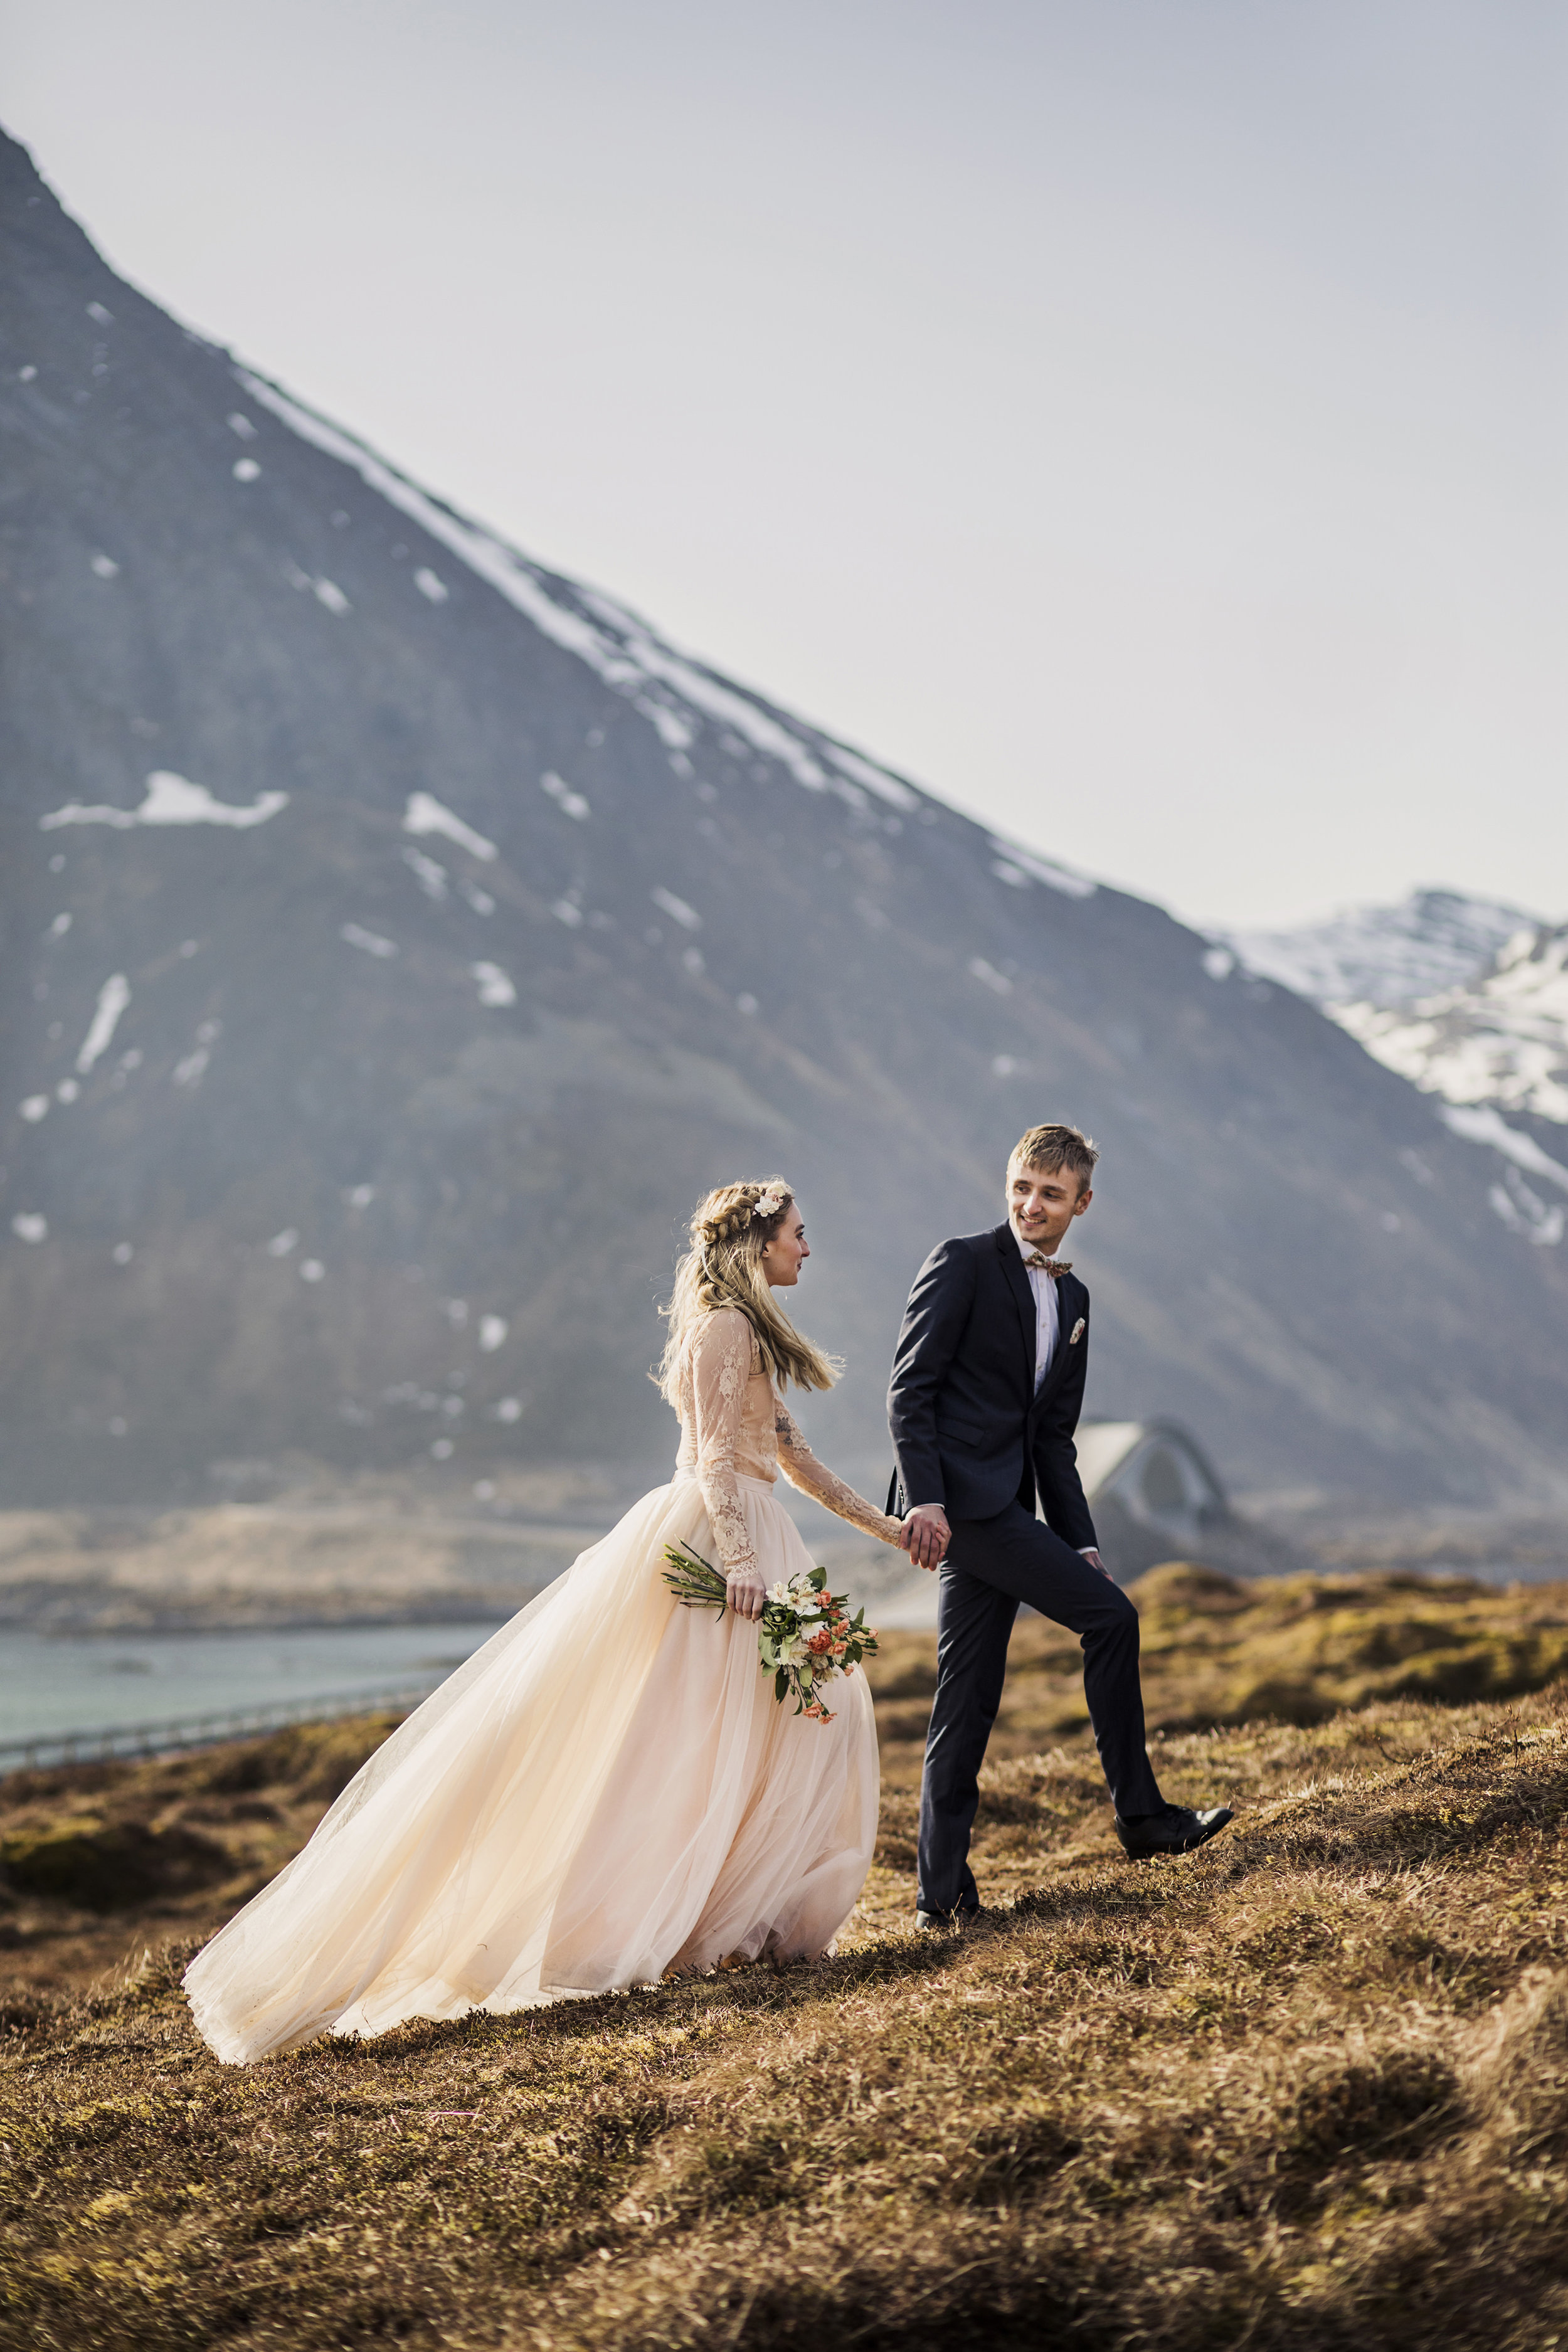 Fotograf:  Amanda Freskgård